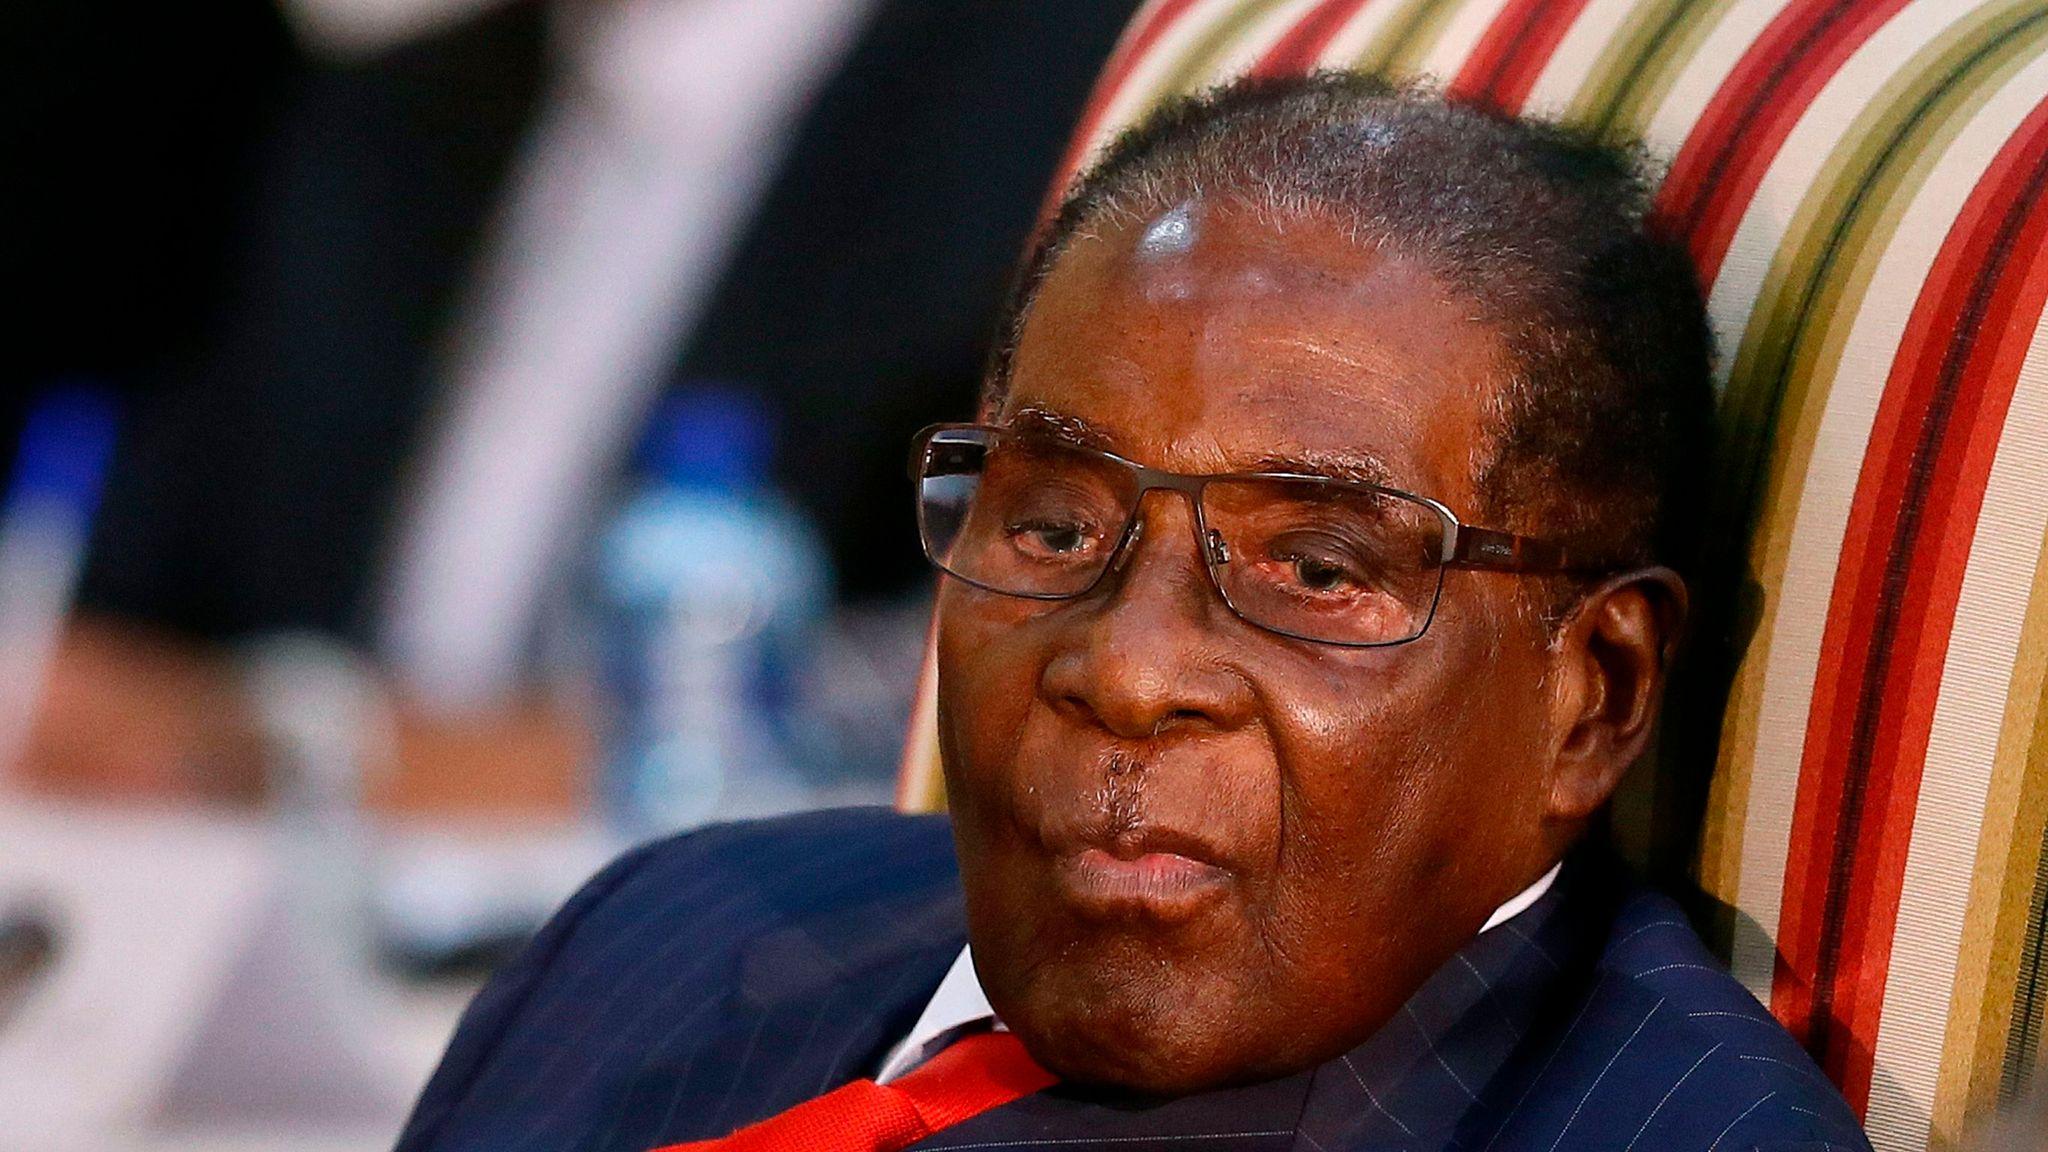 Robert Mugabe: Former president of Zimbabwe dies aged 95